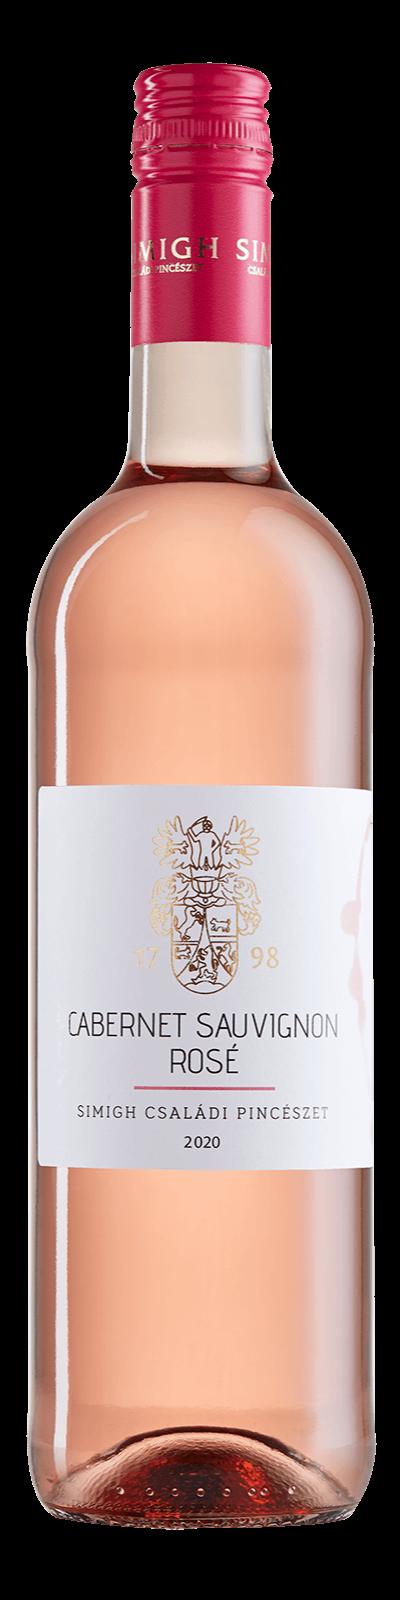 Cabernet Sauvignon Rosé -  Simigh Családi Pincészet